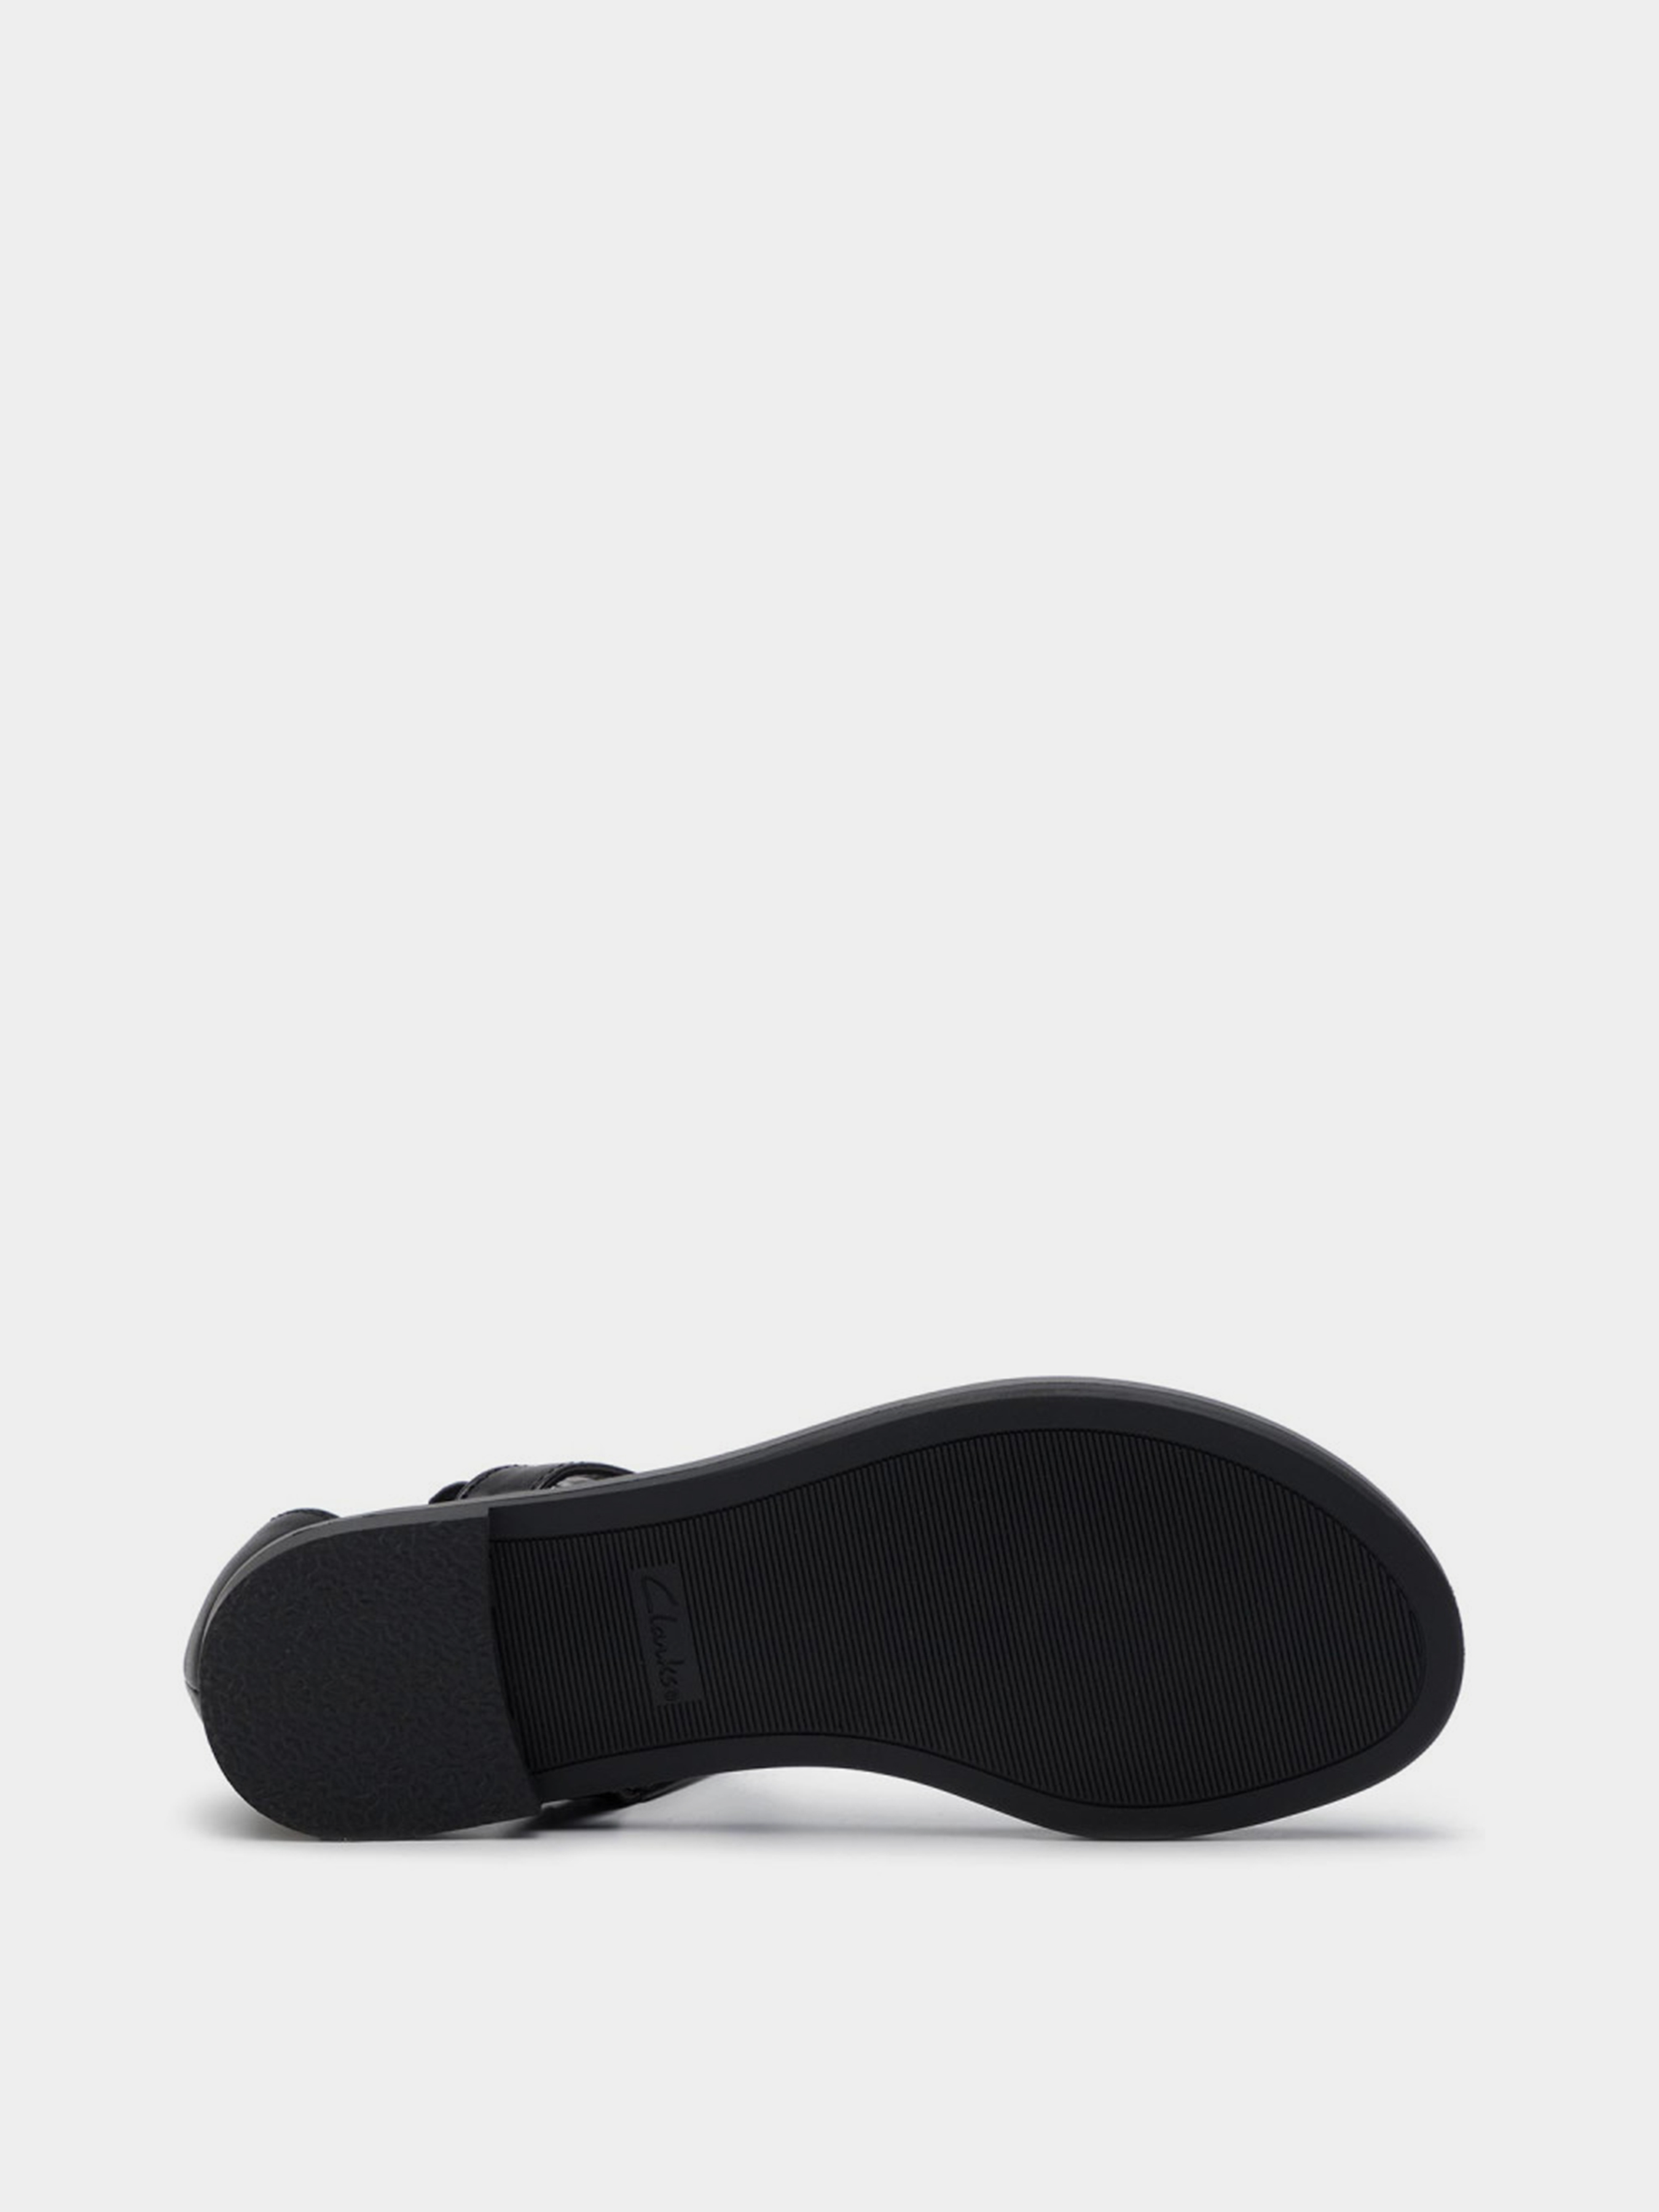 Сандалии женские Clarks Bay Poppy OW4350 размеры обуви, 2017